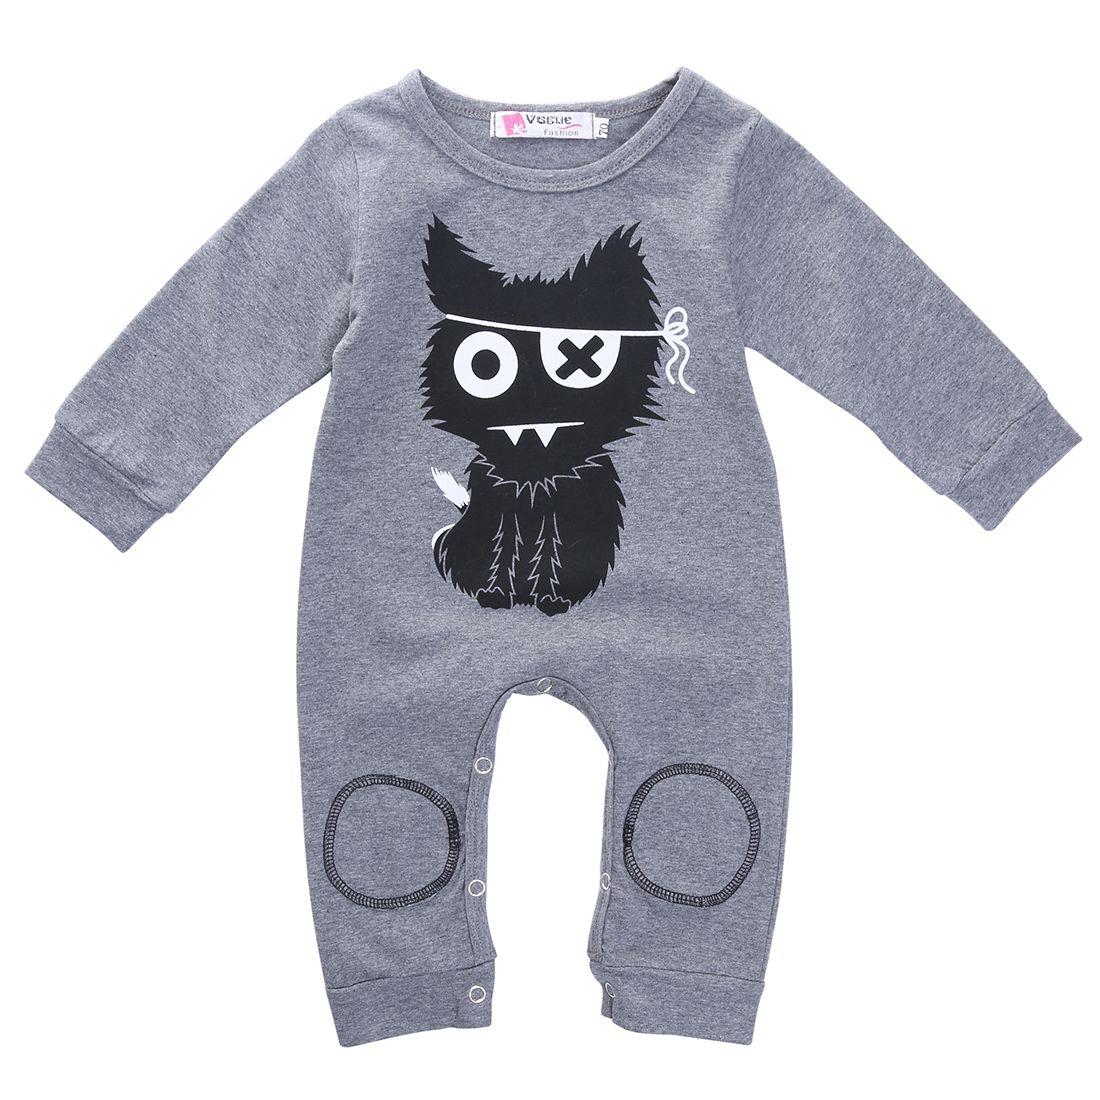 efe58cb96 Click to Buy    2016 Spring Newborn Baby Boy Girls Long Sleeve ...